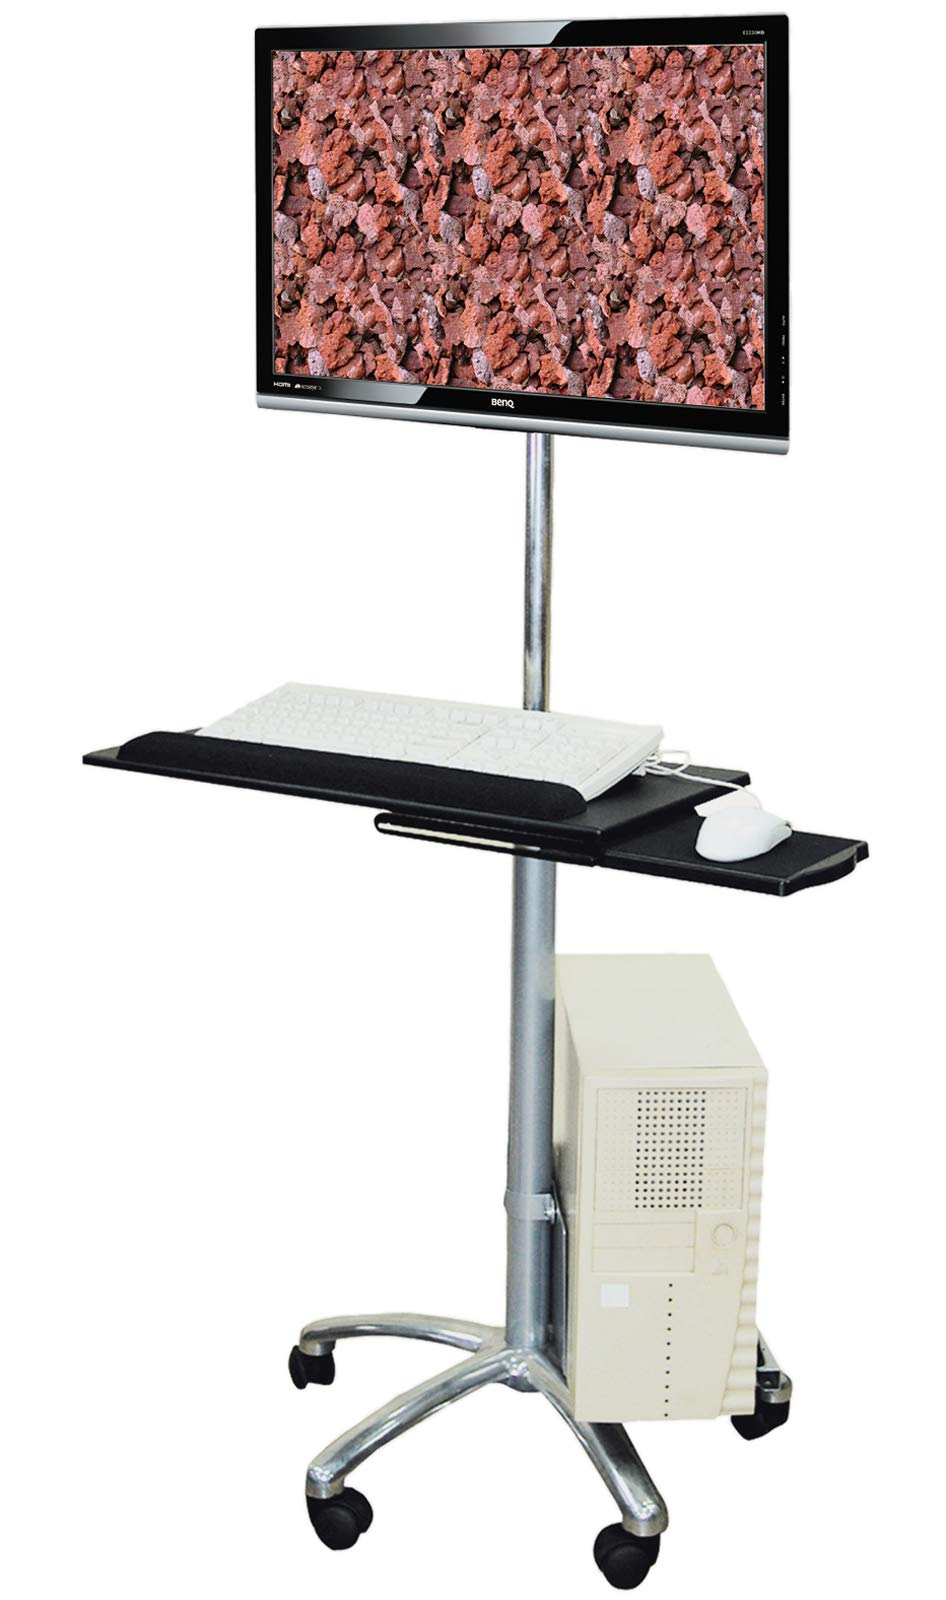 Value Mobile PC Cart, Silver - Soporte para televisor (Silver, 10 kg): Amazon.es: Electrónica